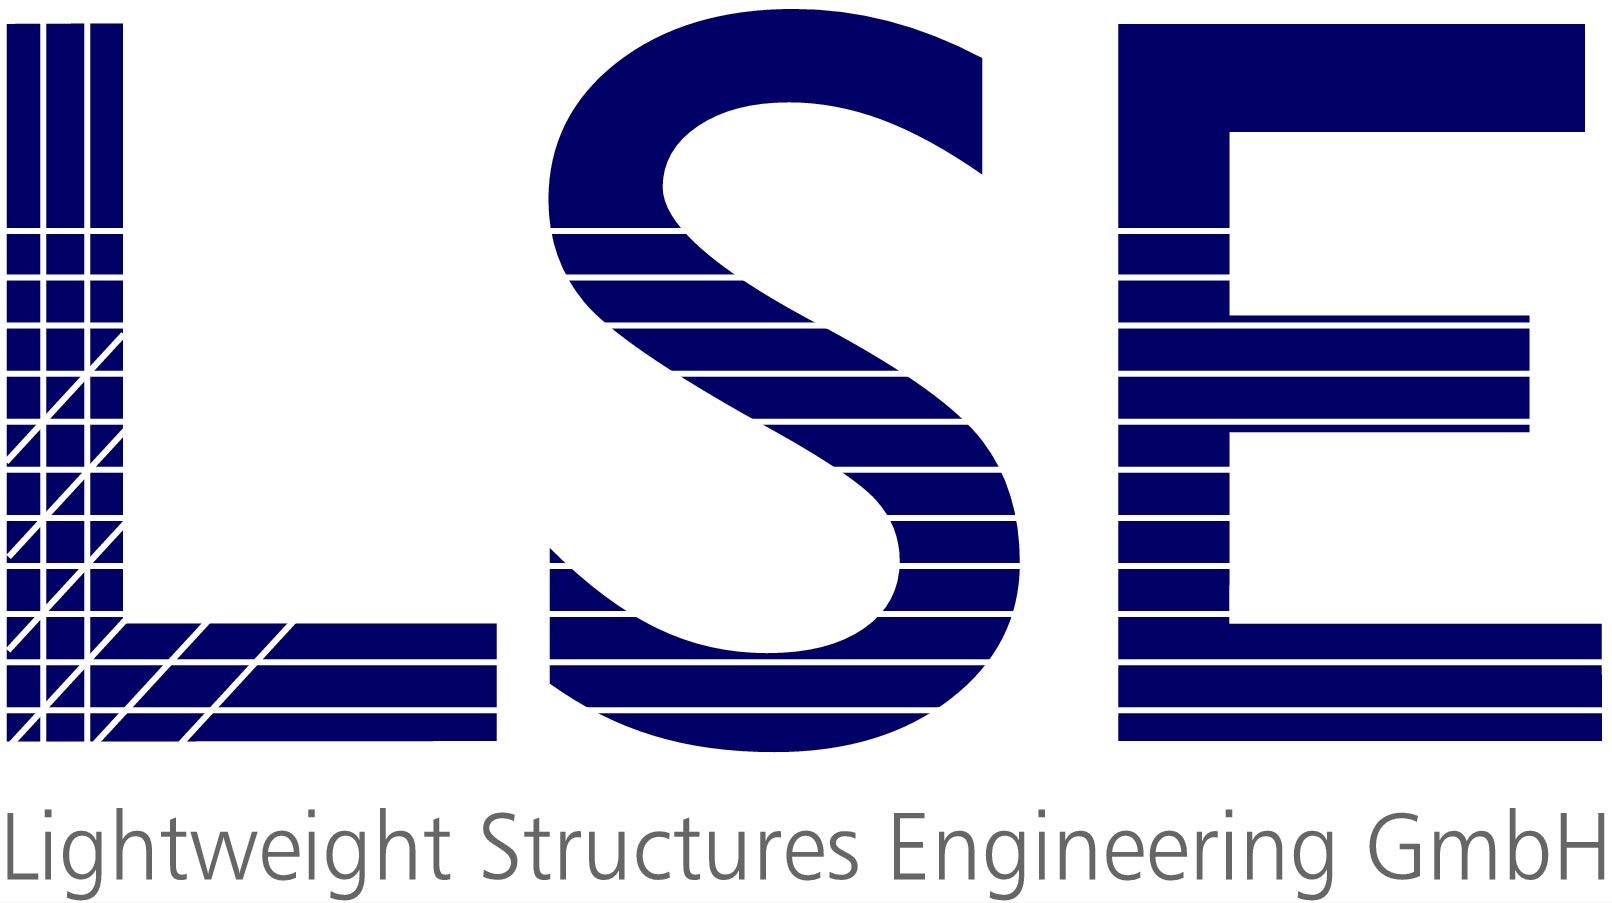 LSE Lightweight Structures Engineering GmbH